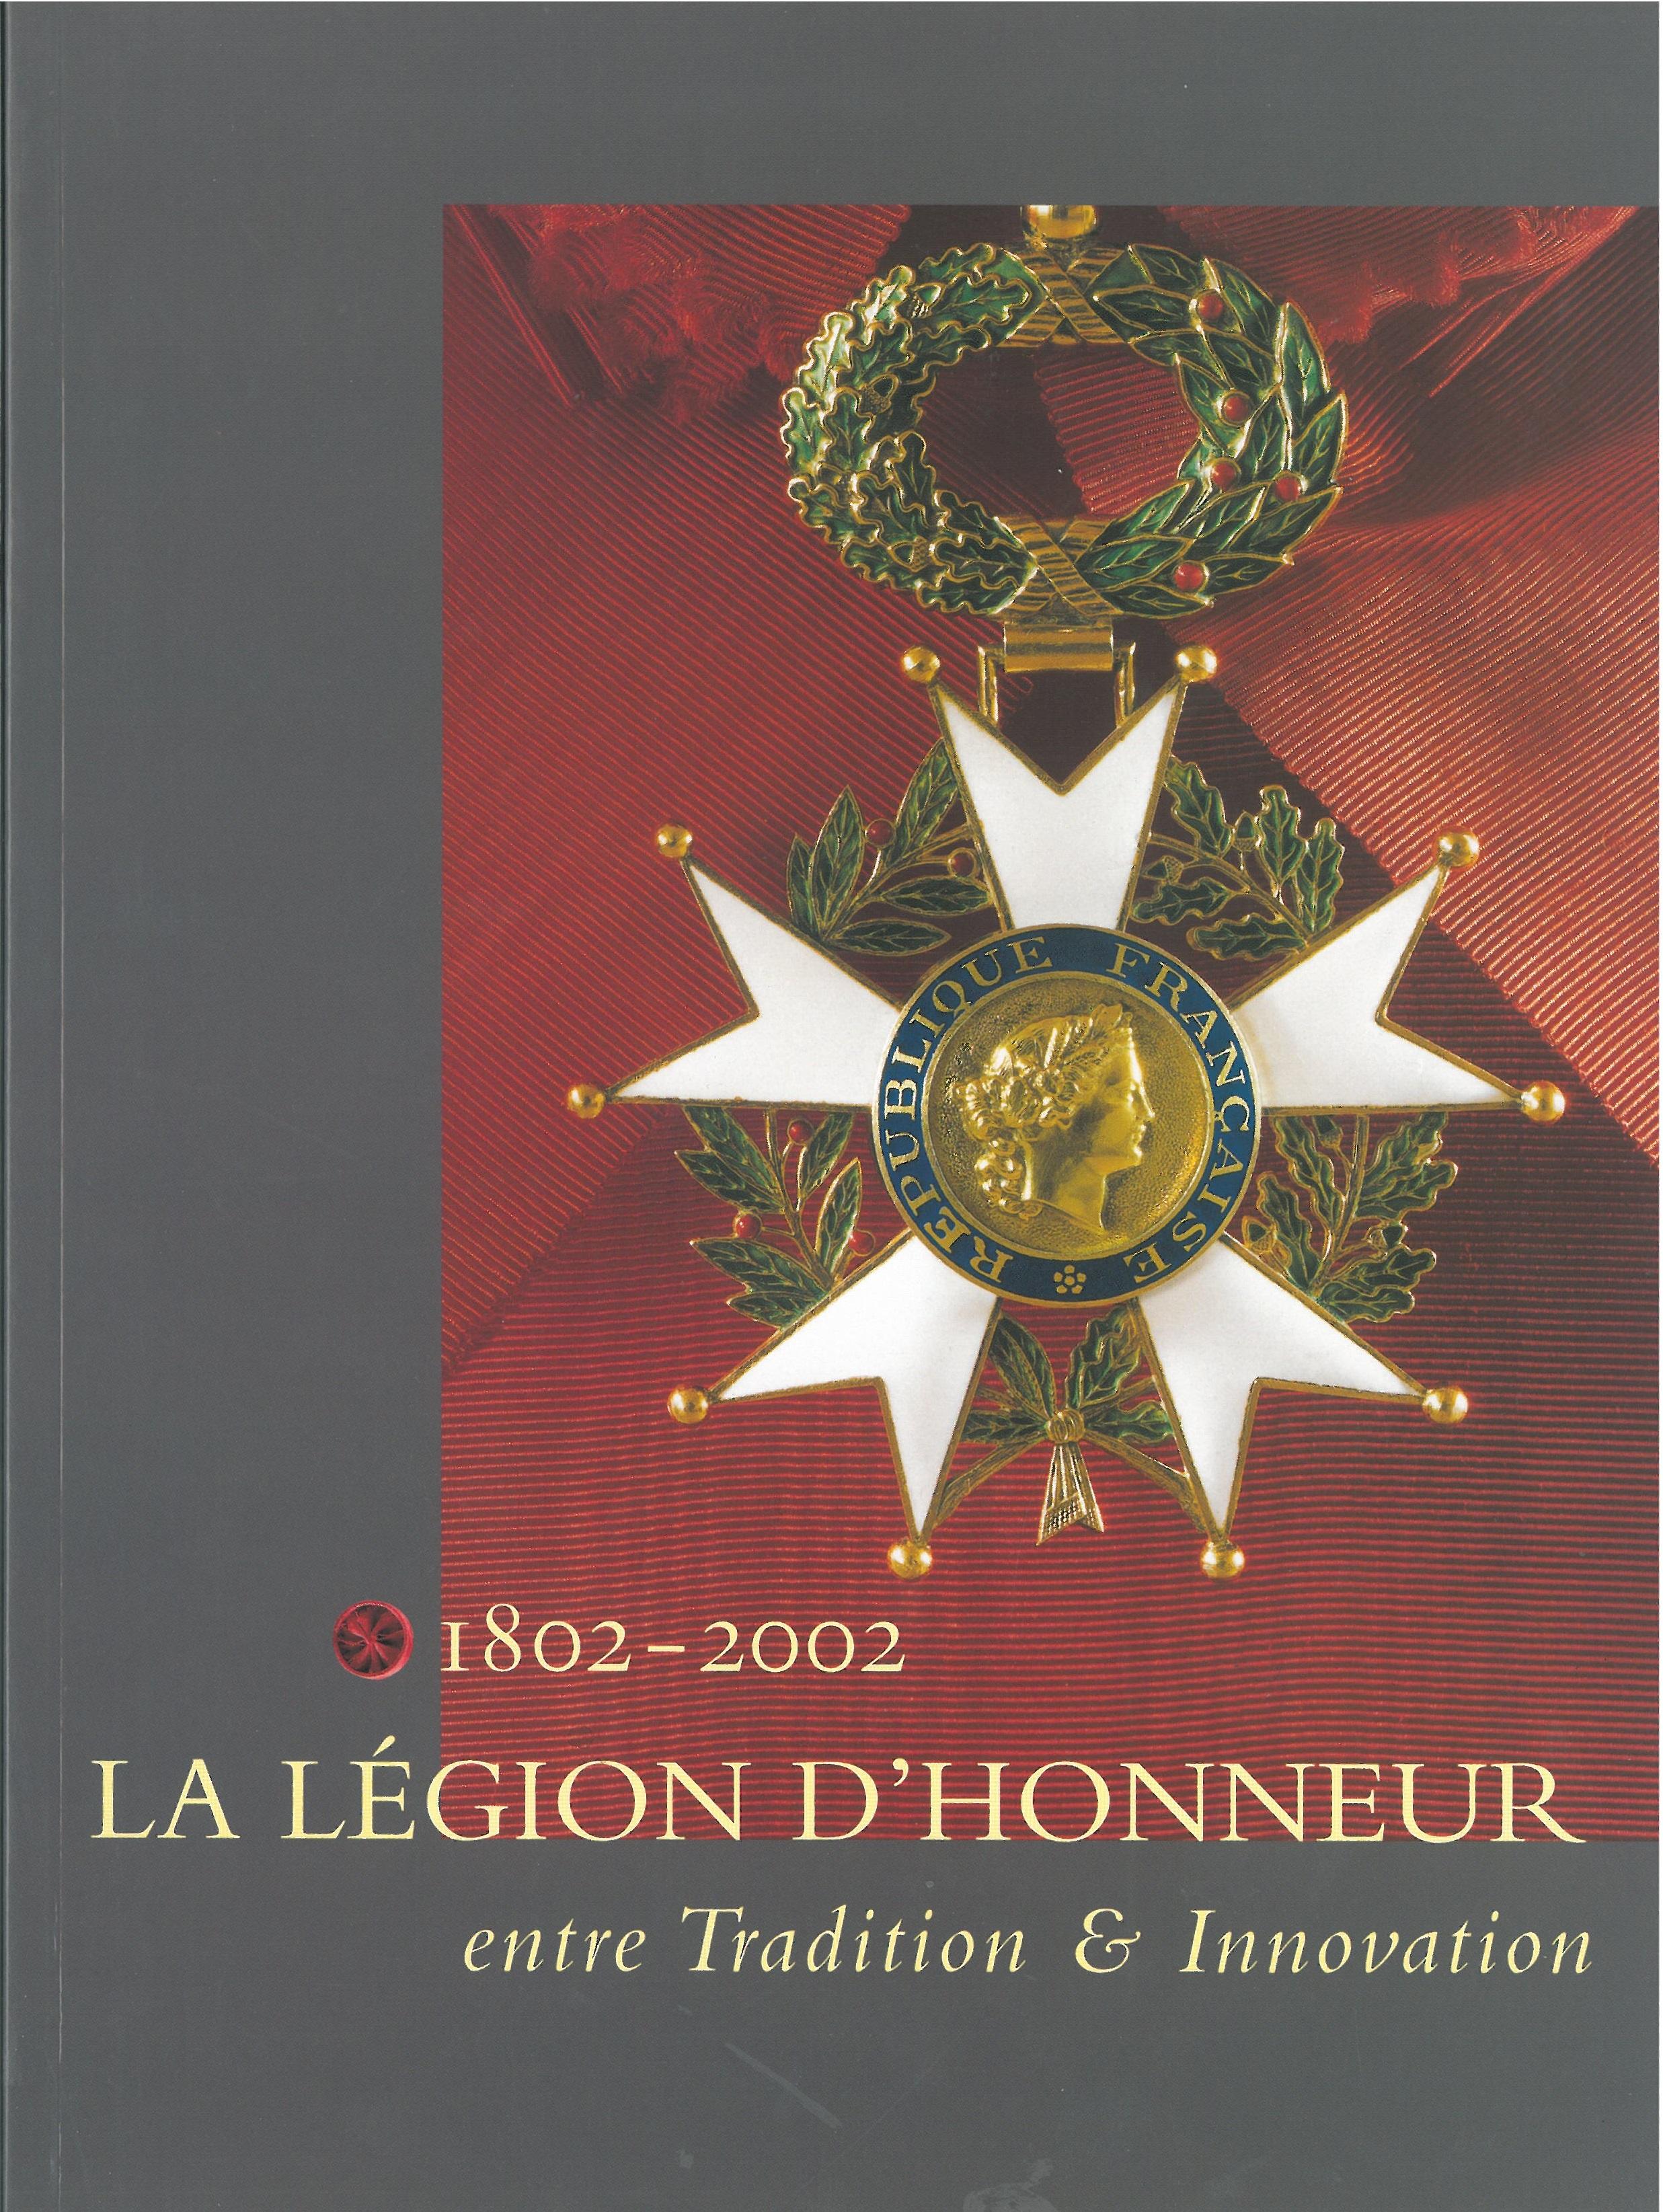 Legion d'honneur 2002